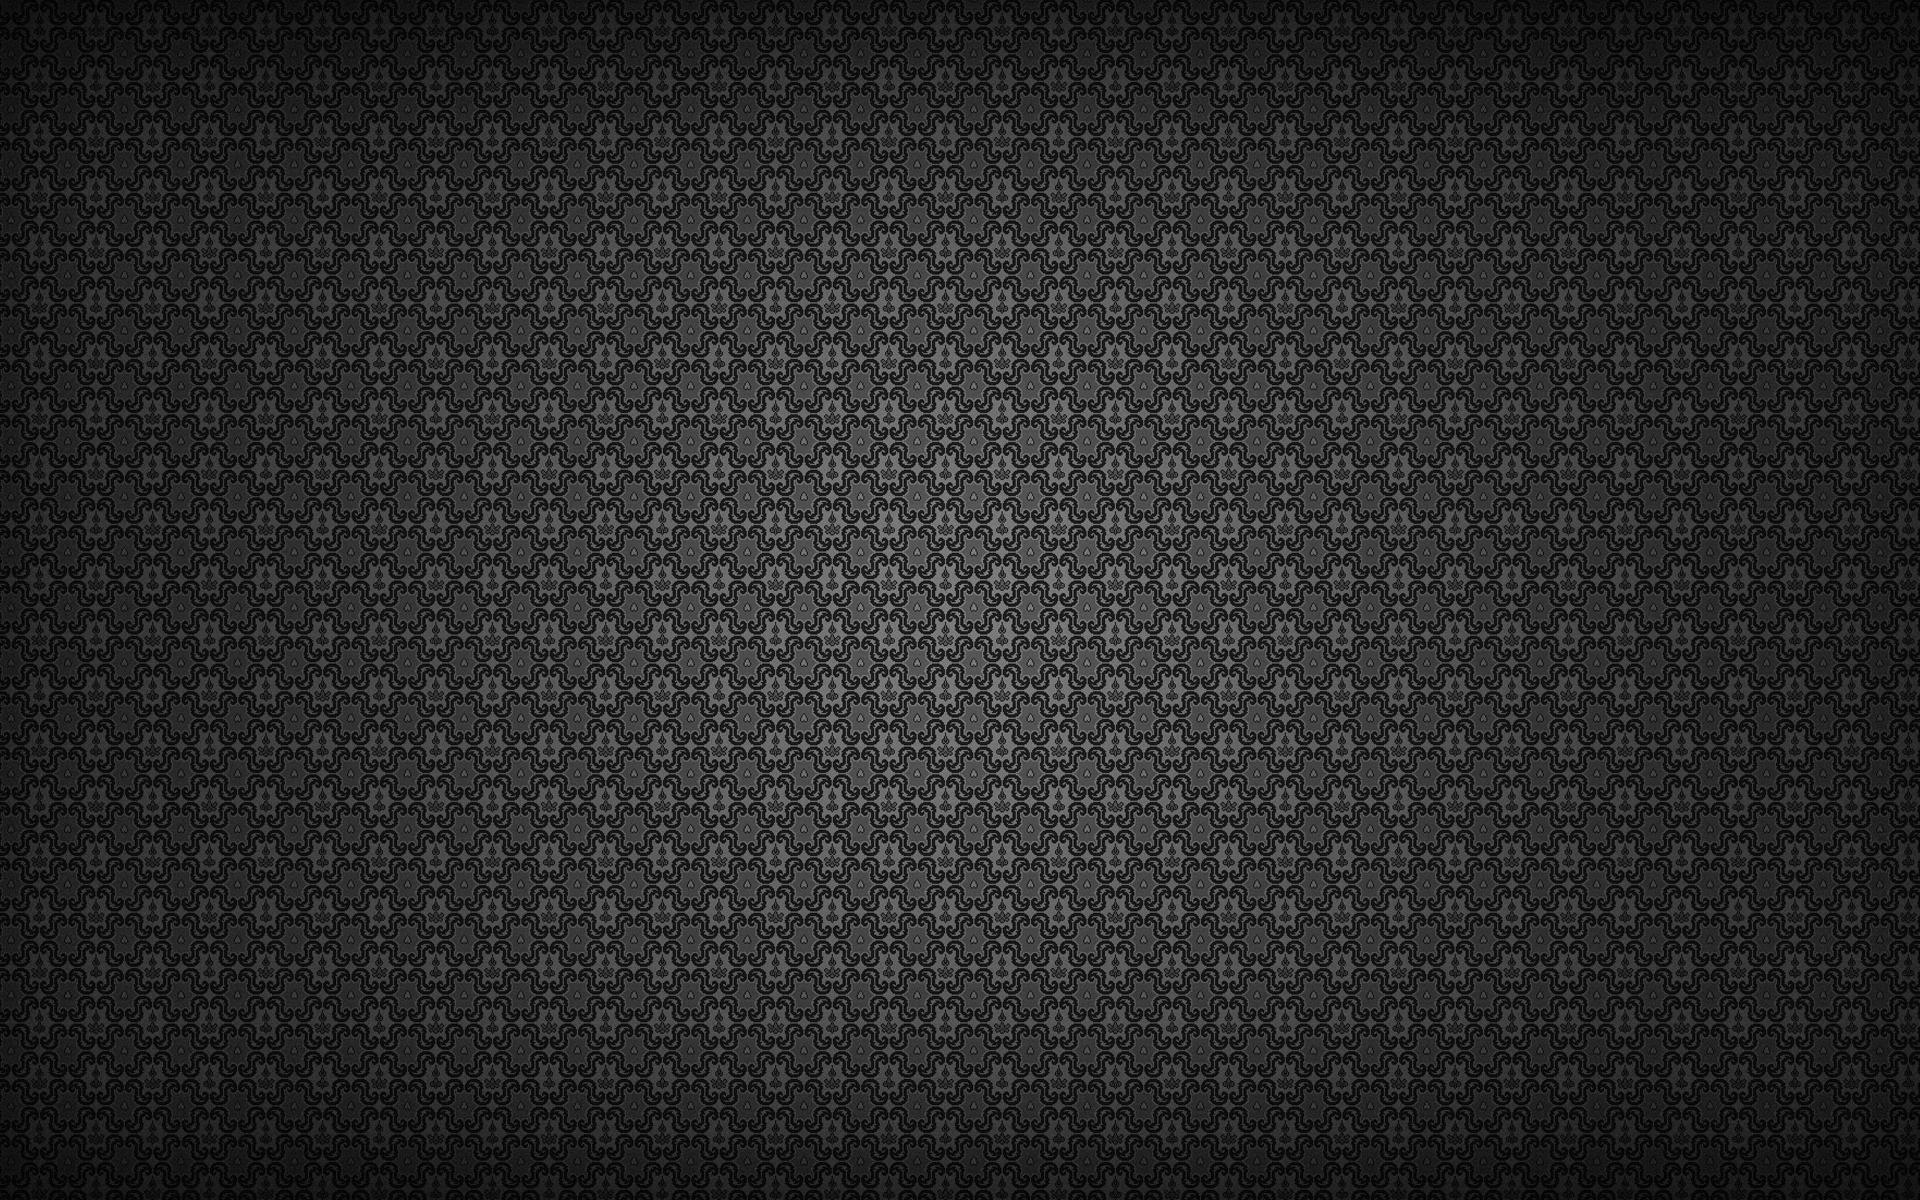 texture wallpapers 41253